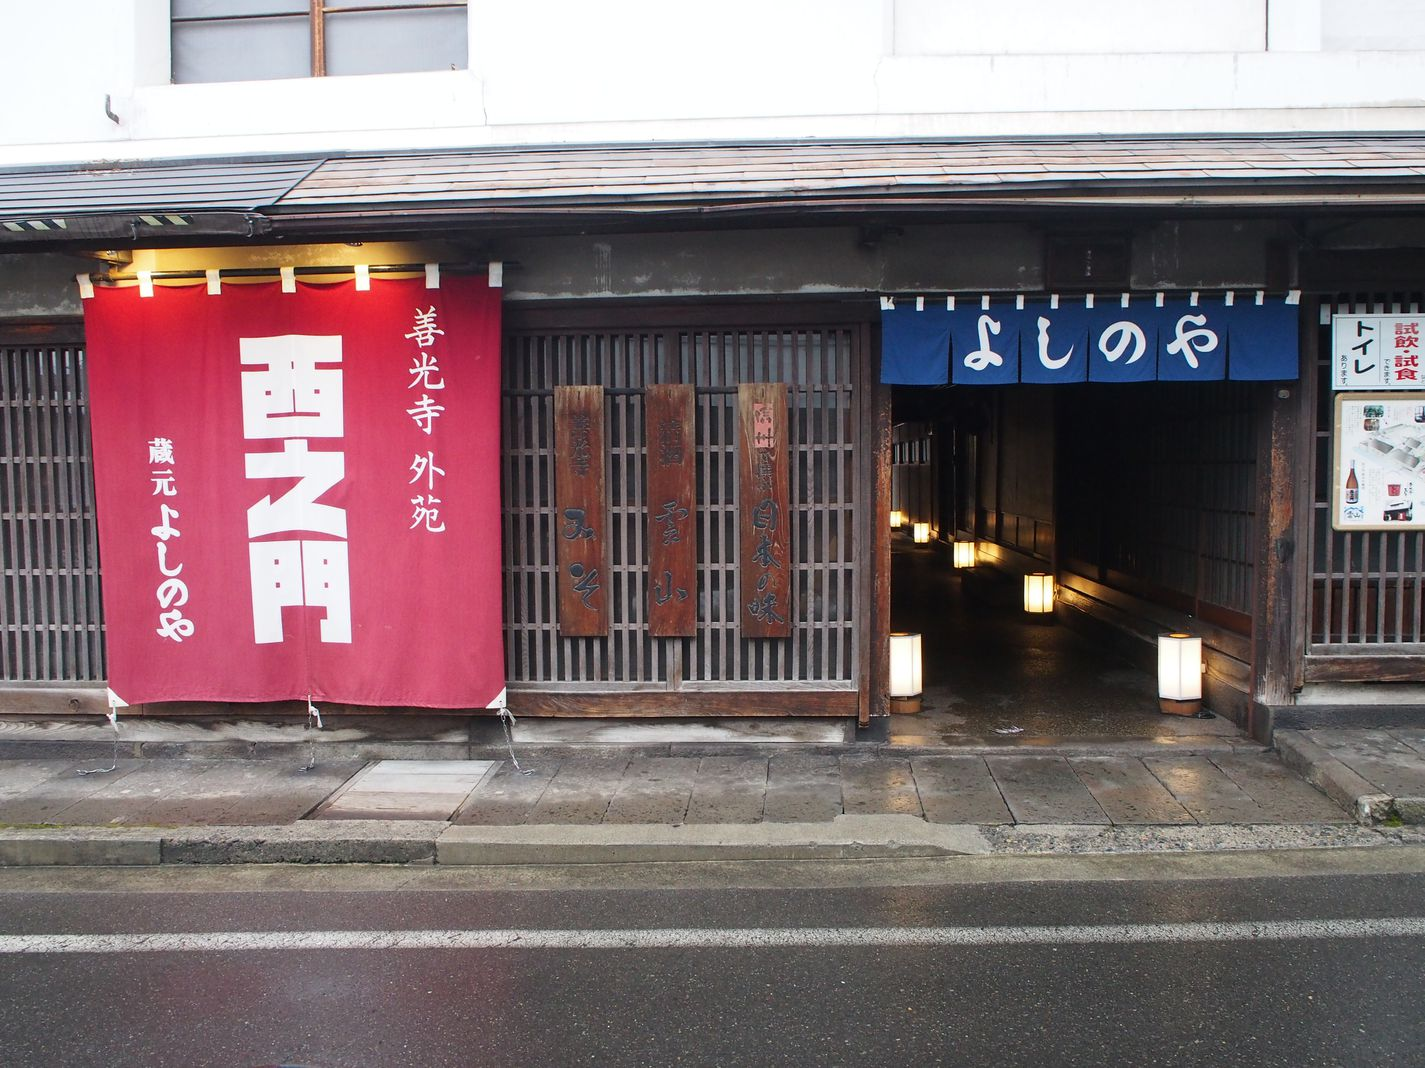 Zenkoji Gaien Nishinomon Yoshinoya